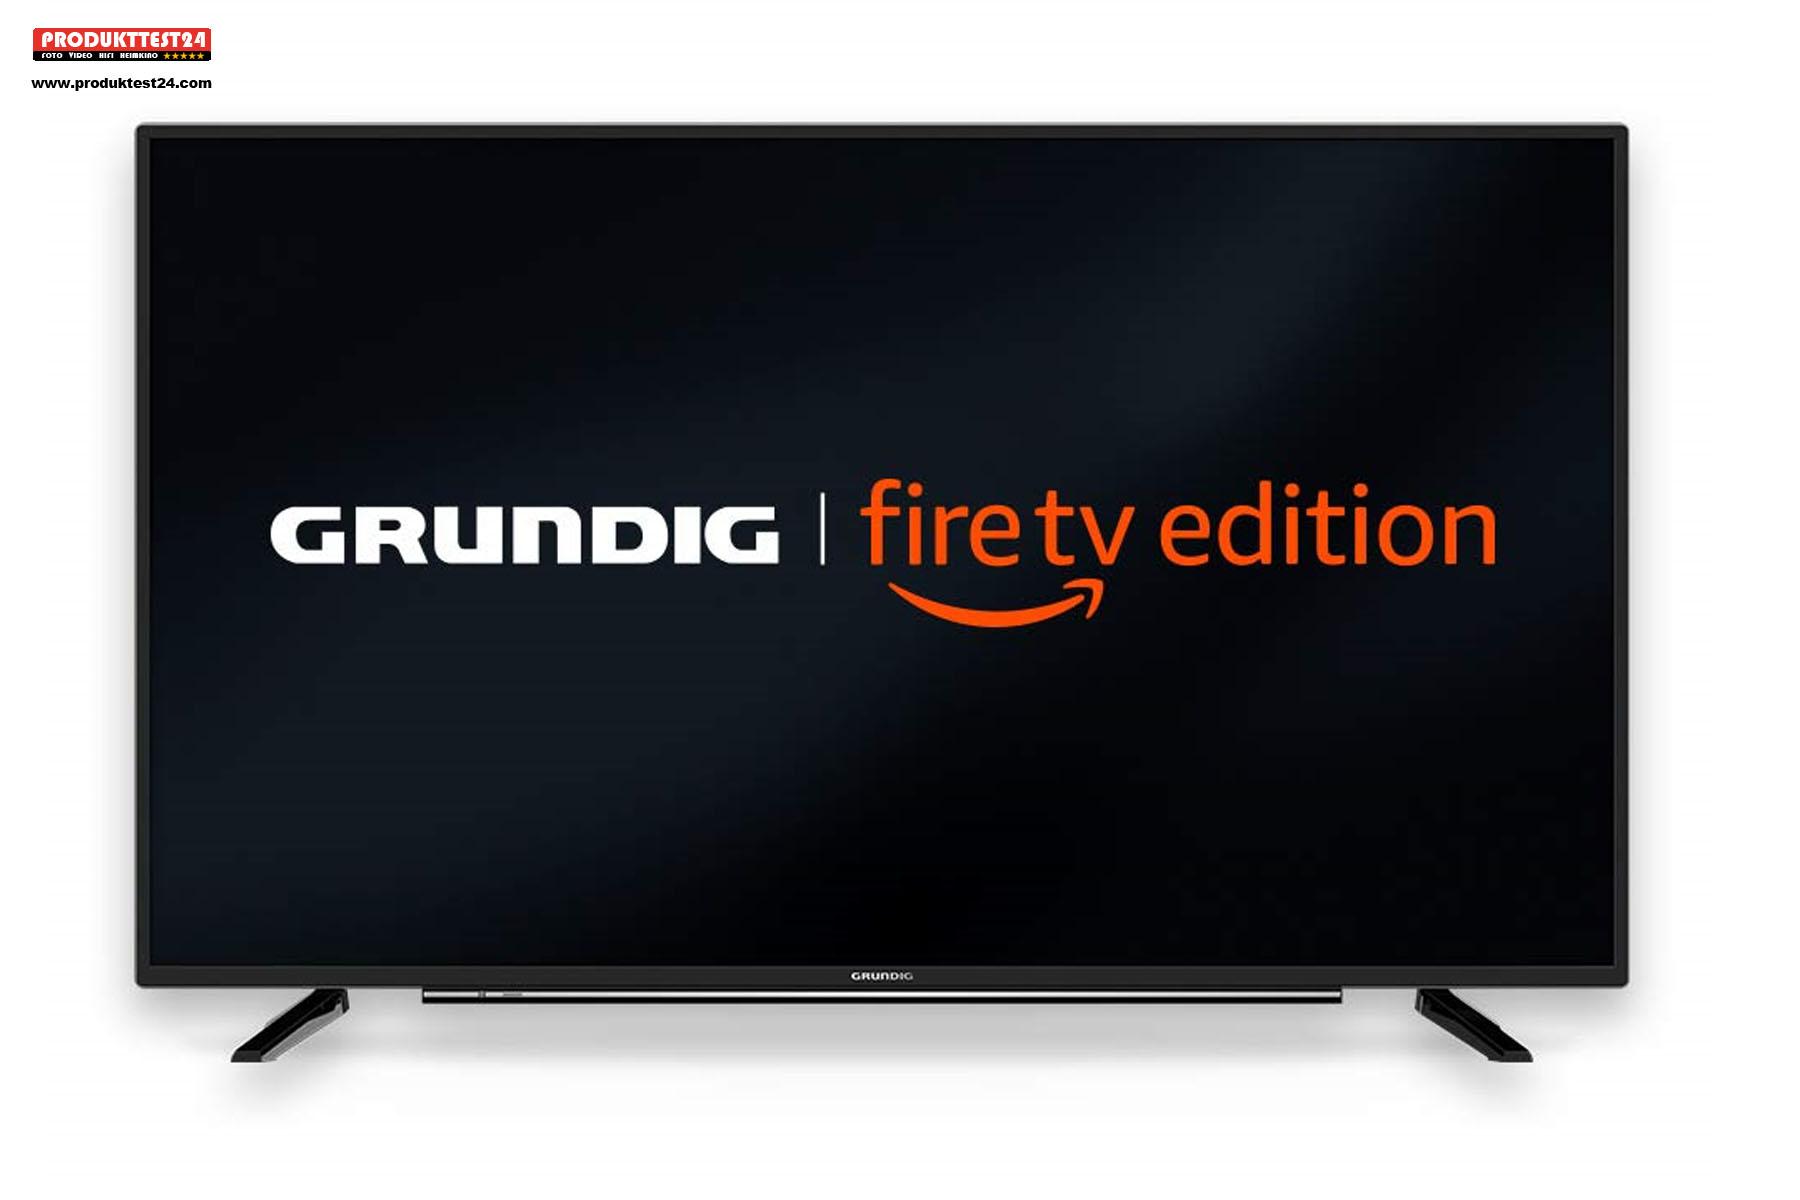 Grundig 40 VLE 6010 - 40 Zoll Bilddiagonale und Full HD Auflösung